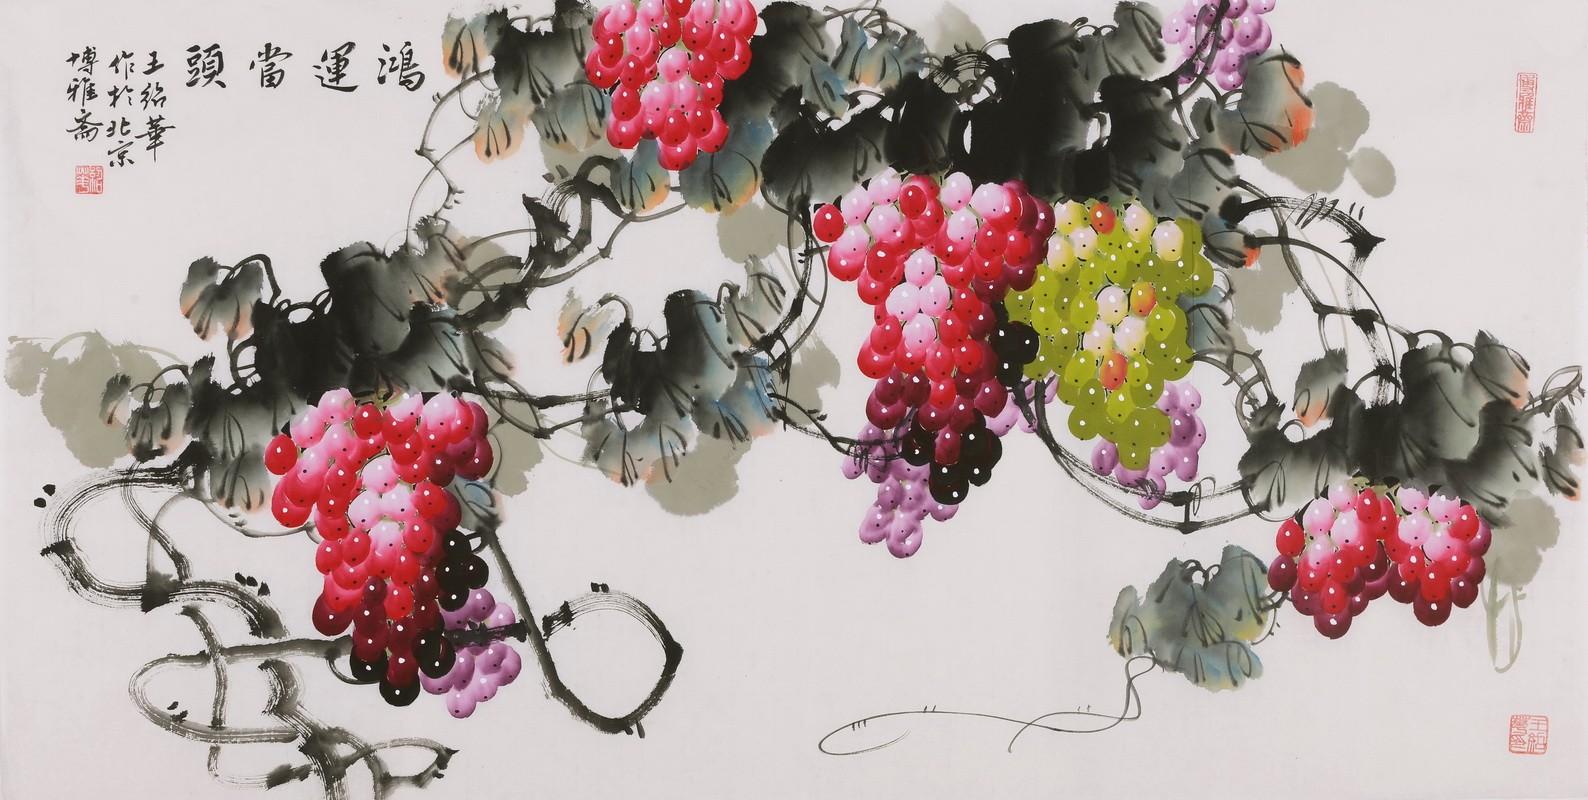 Grapes - CNAG003527